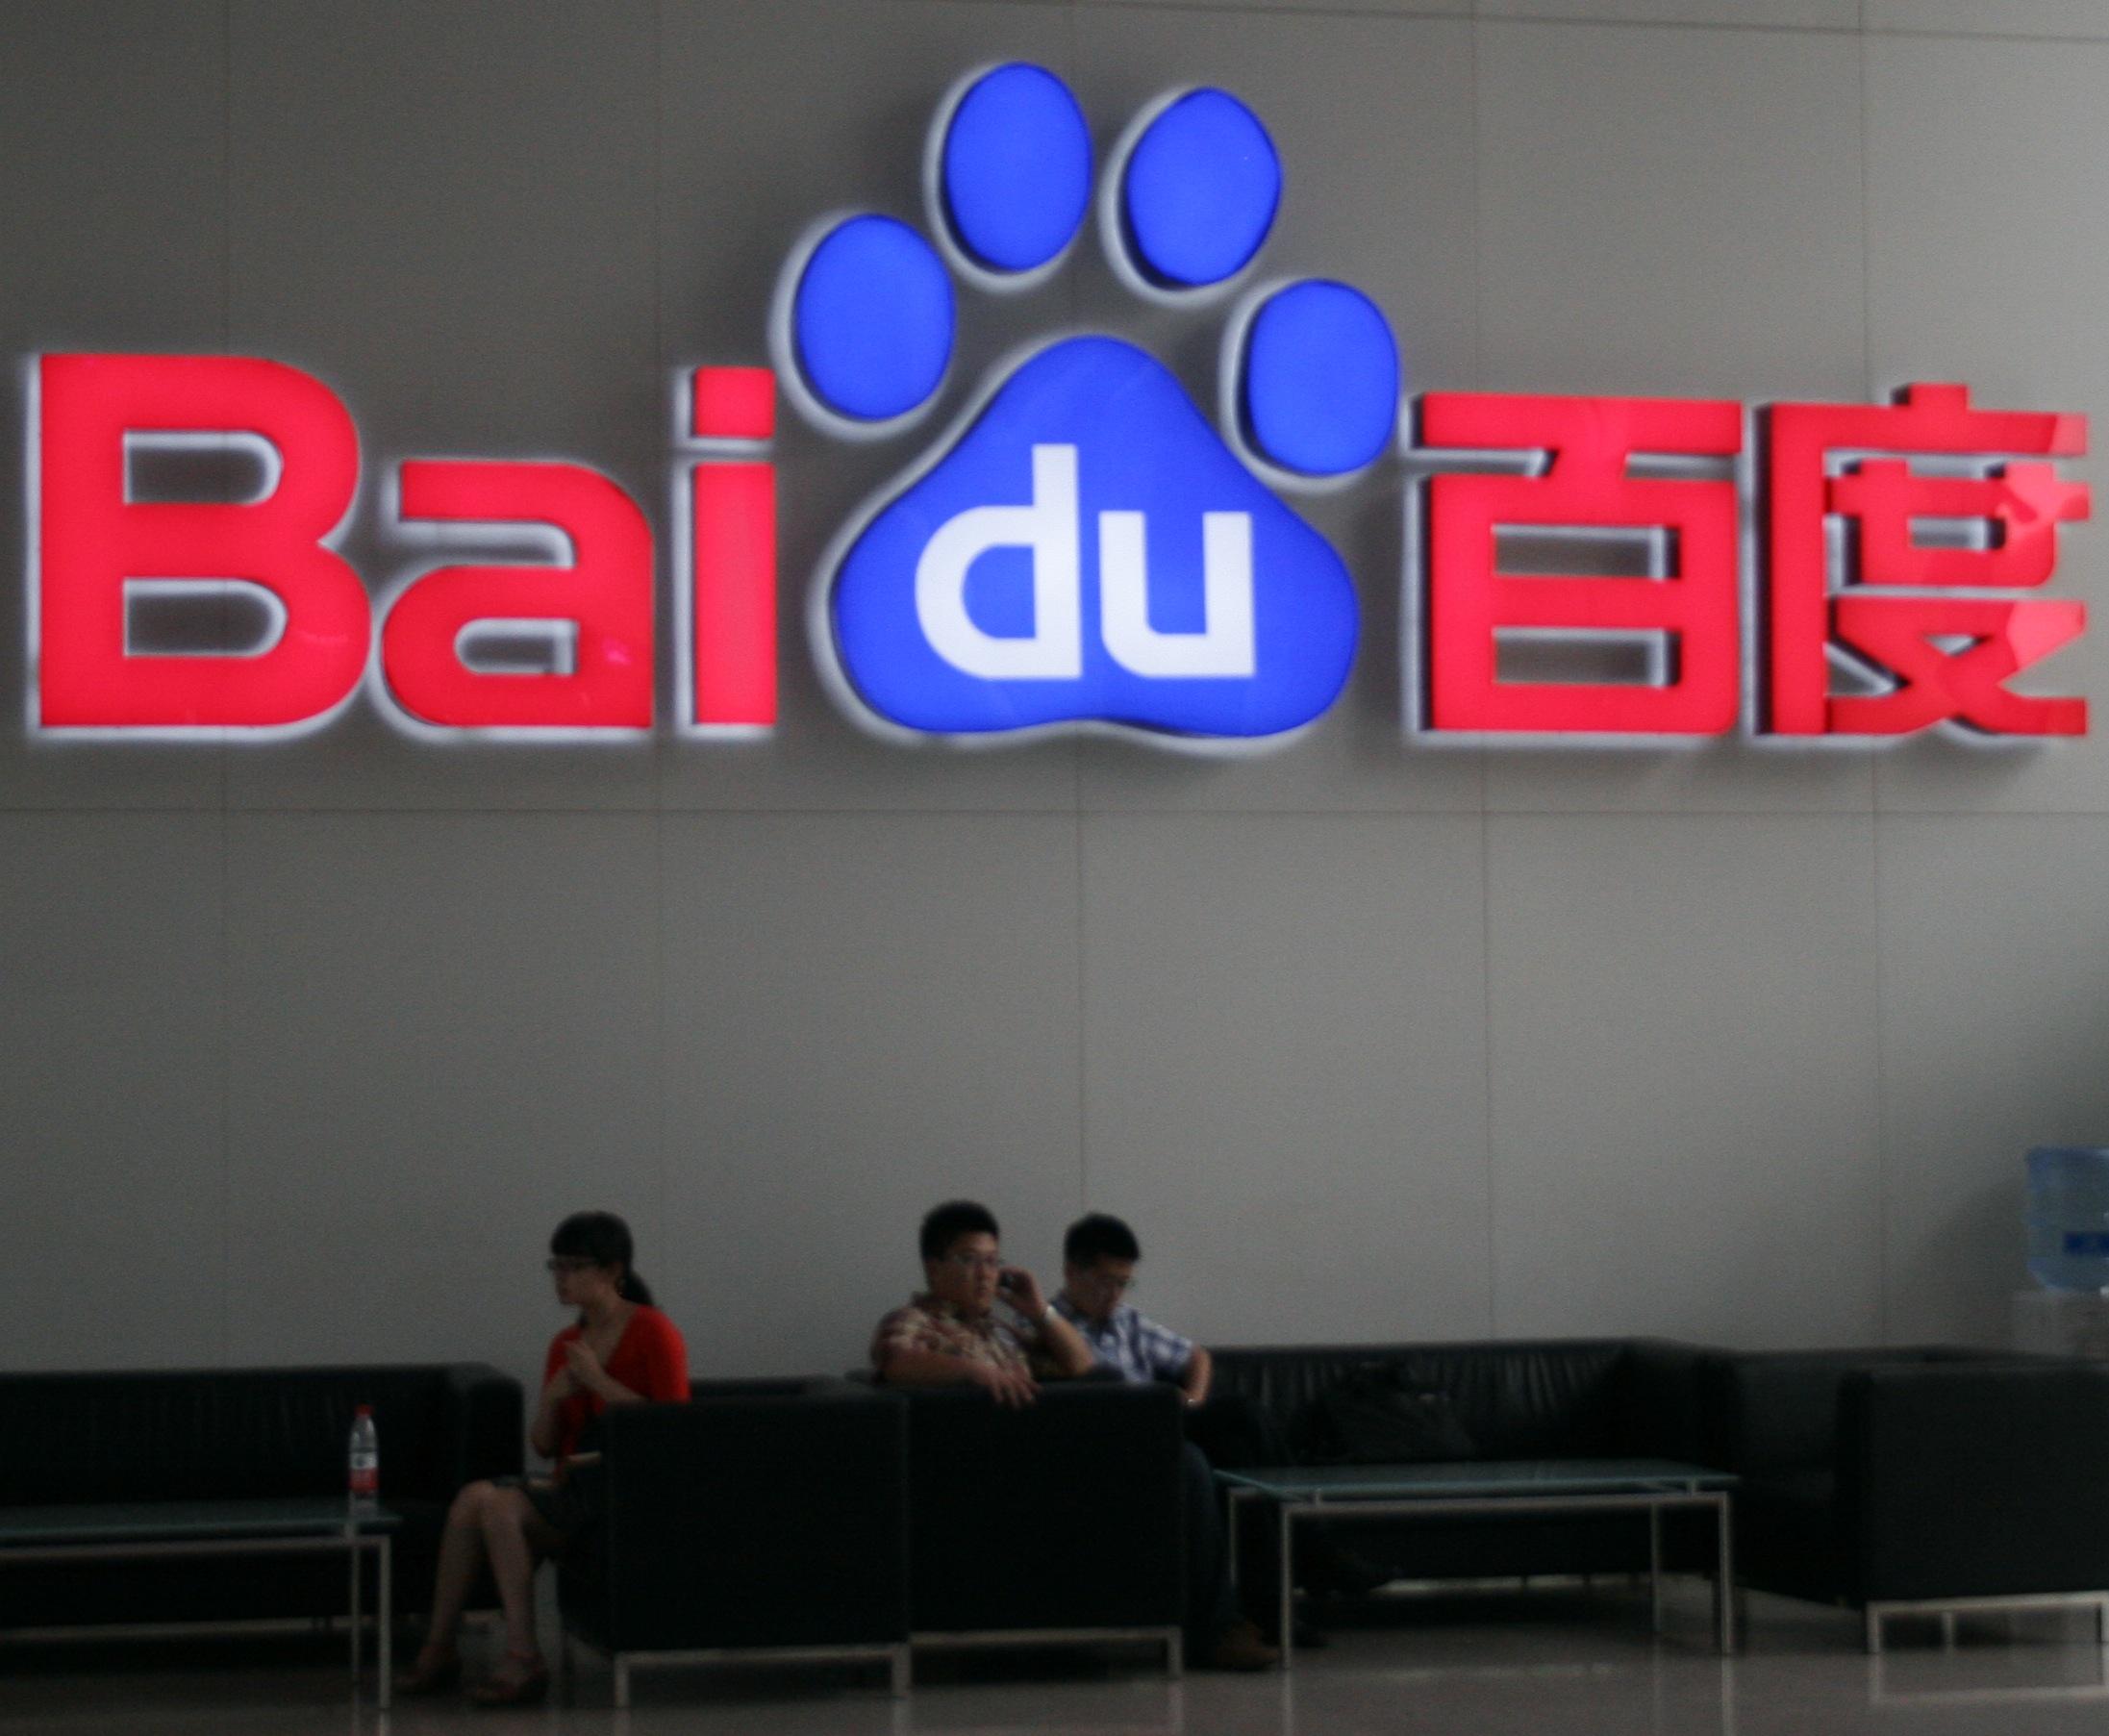 Baidu's sign in Shanghai.